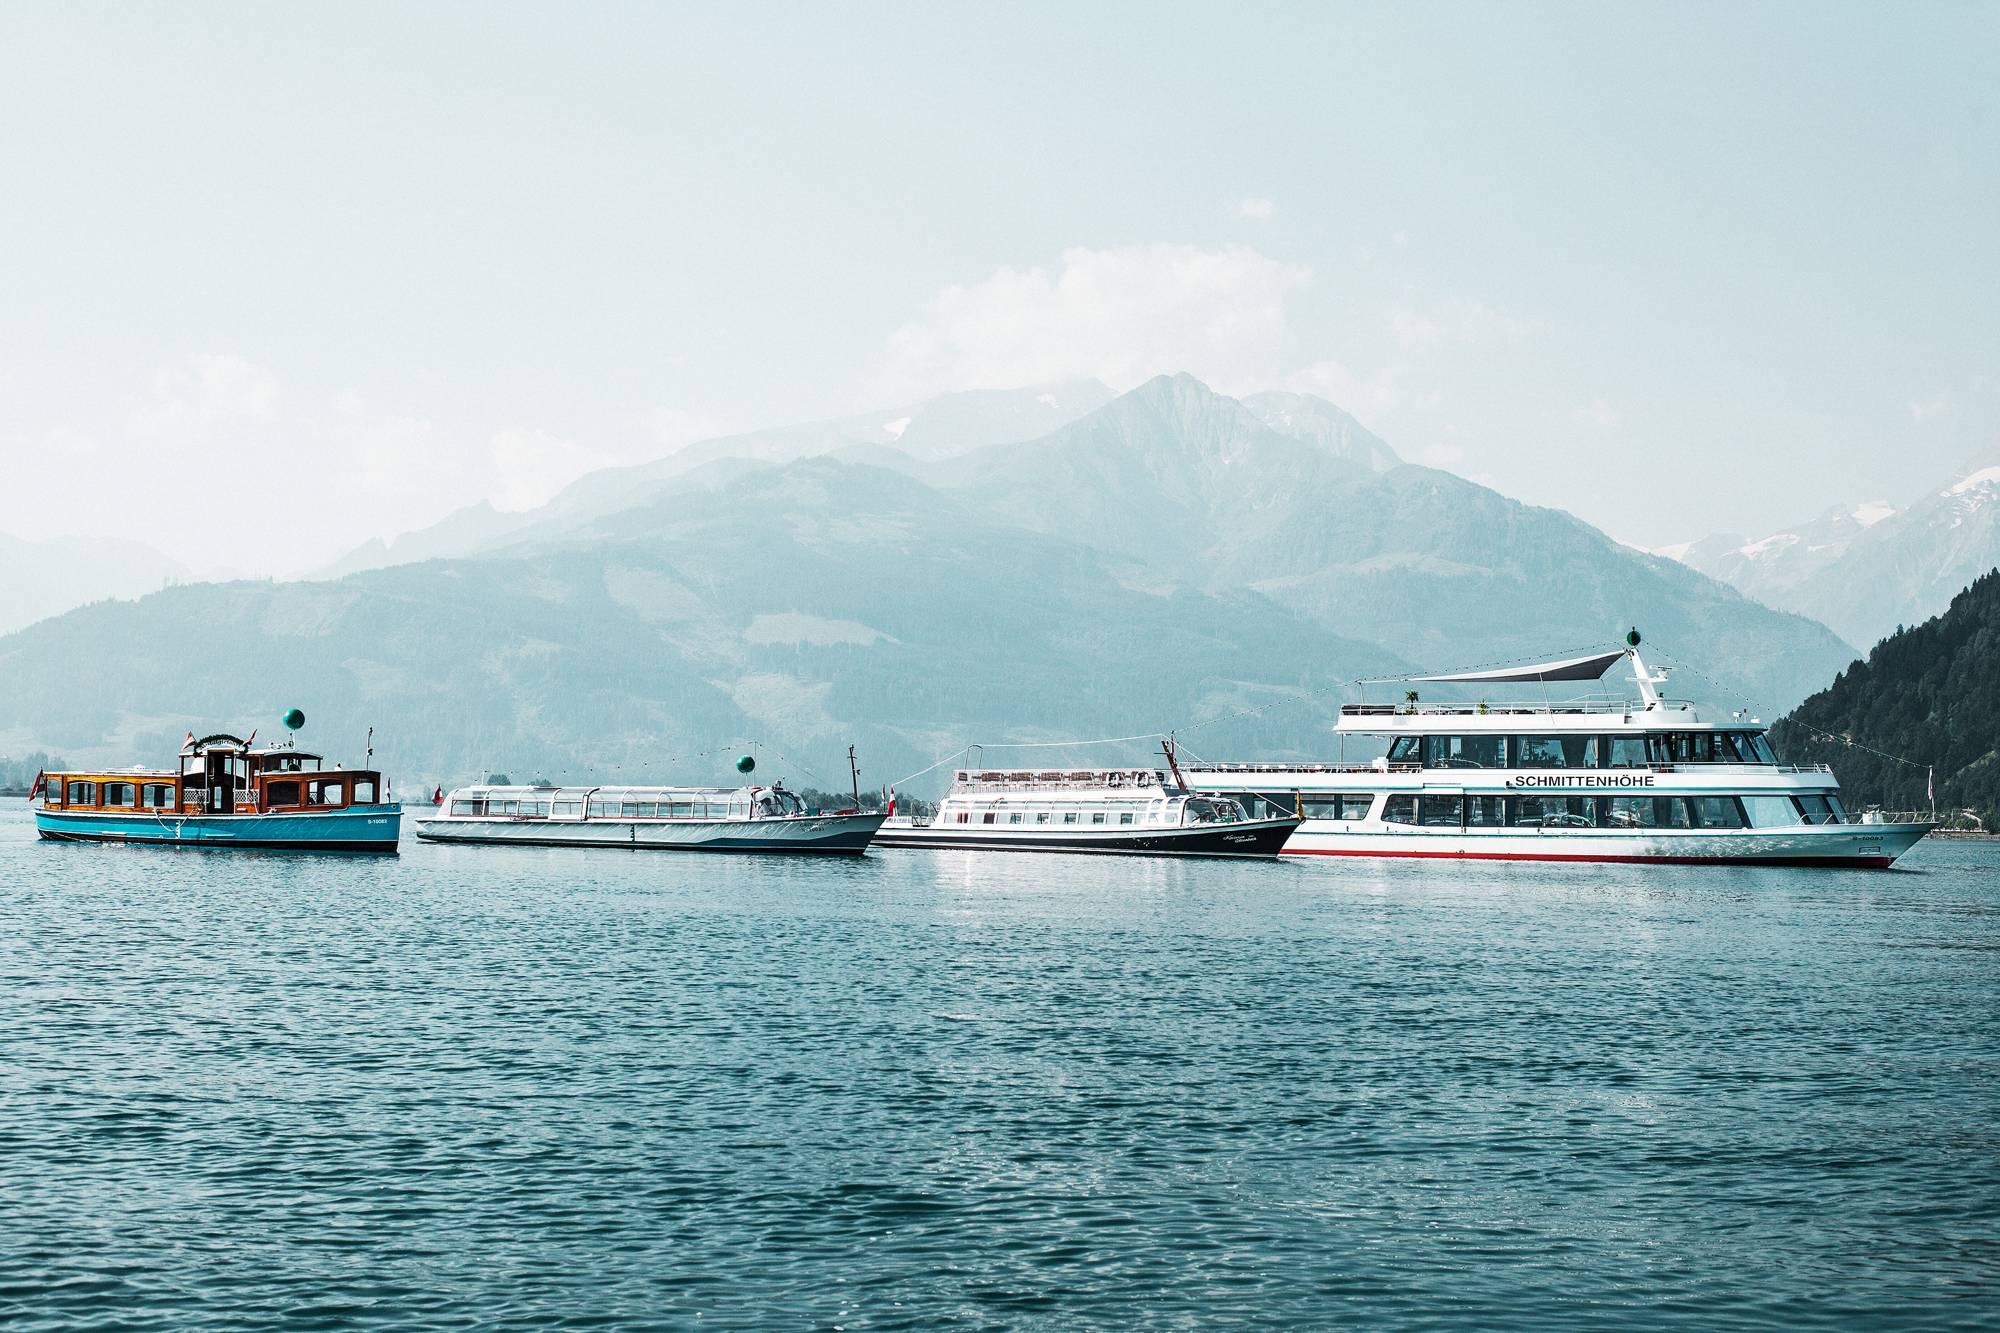 The fleet at lake Zell